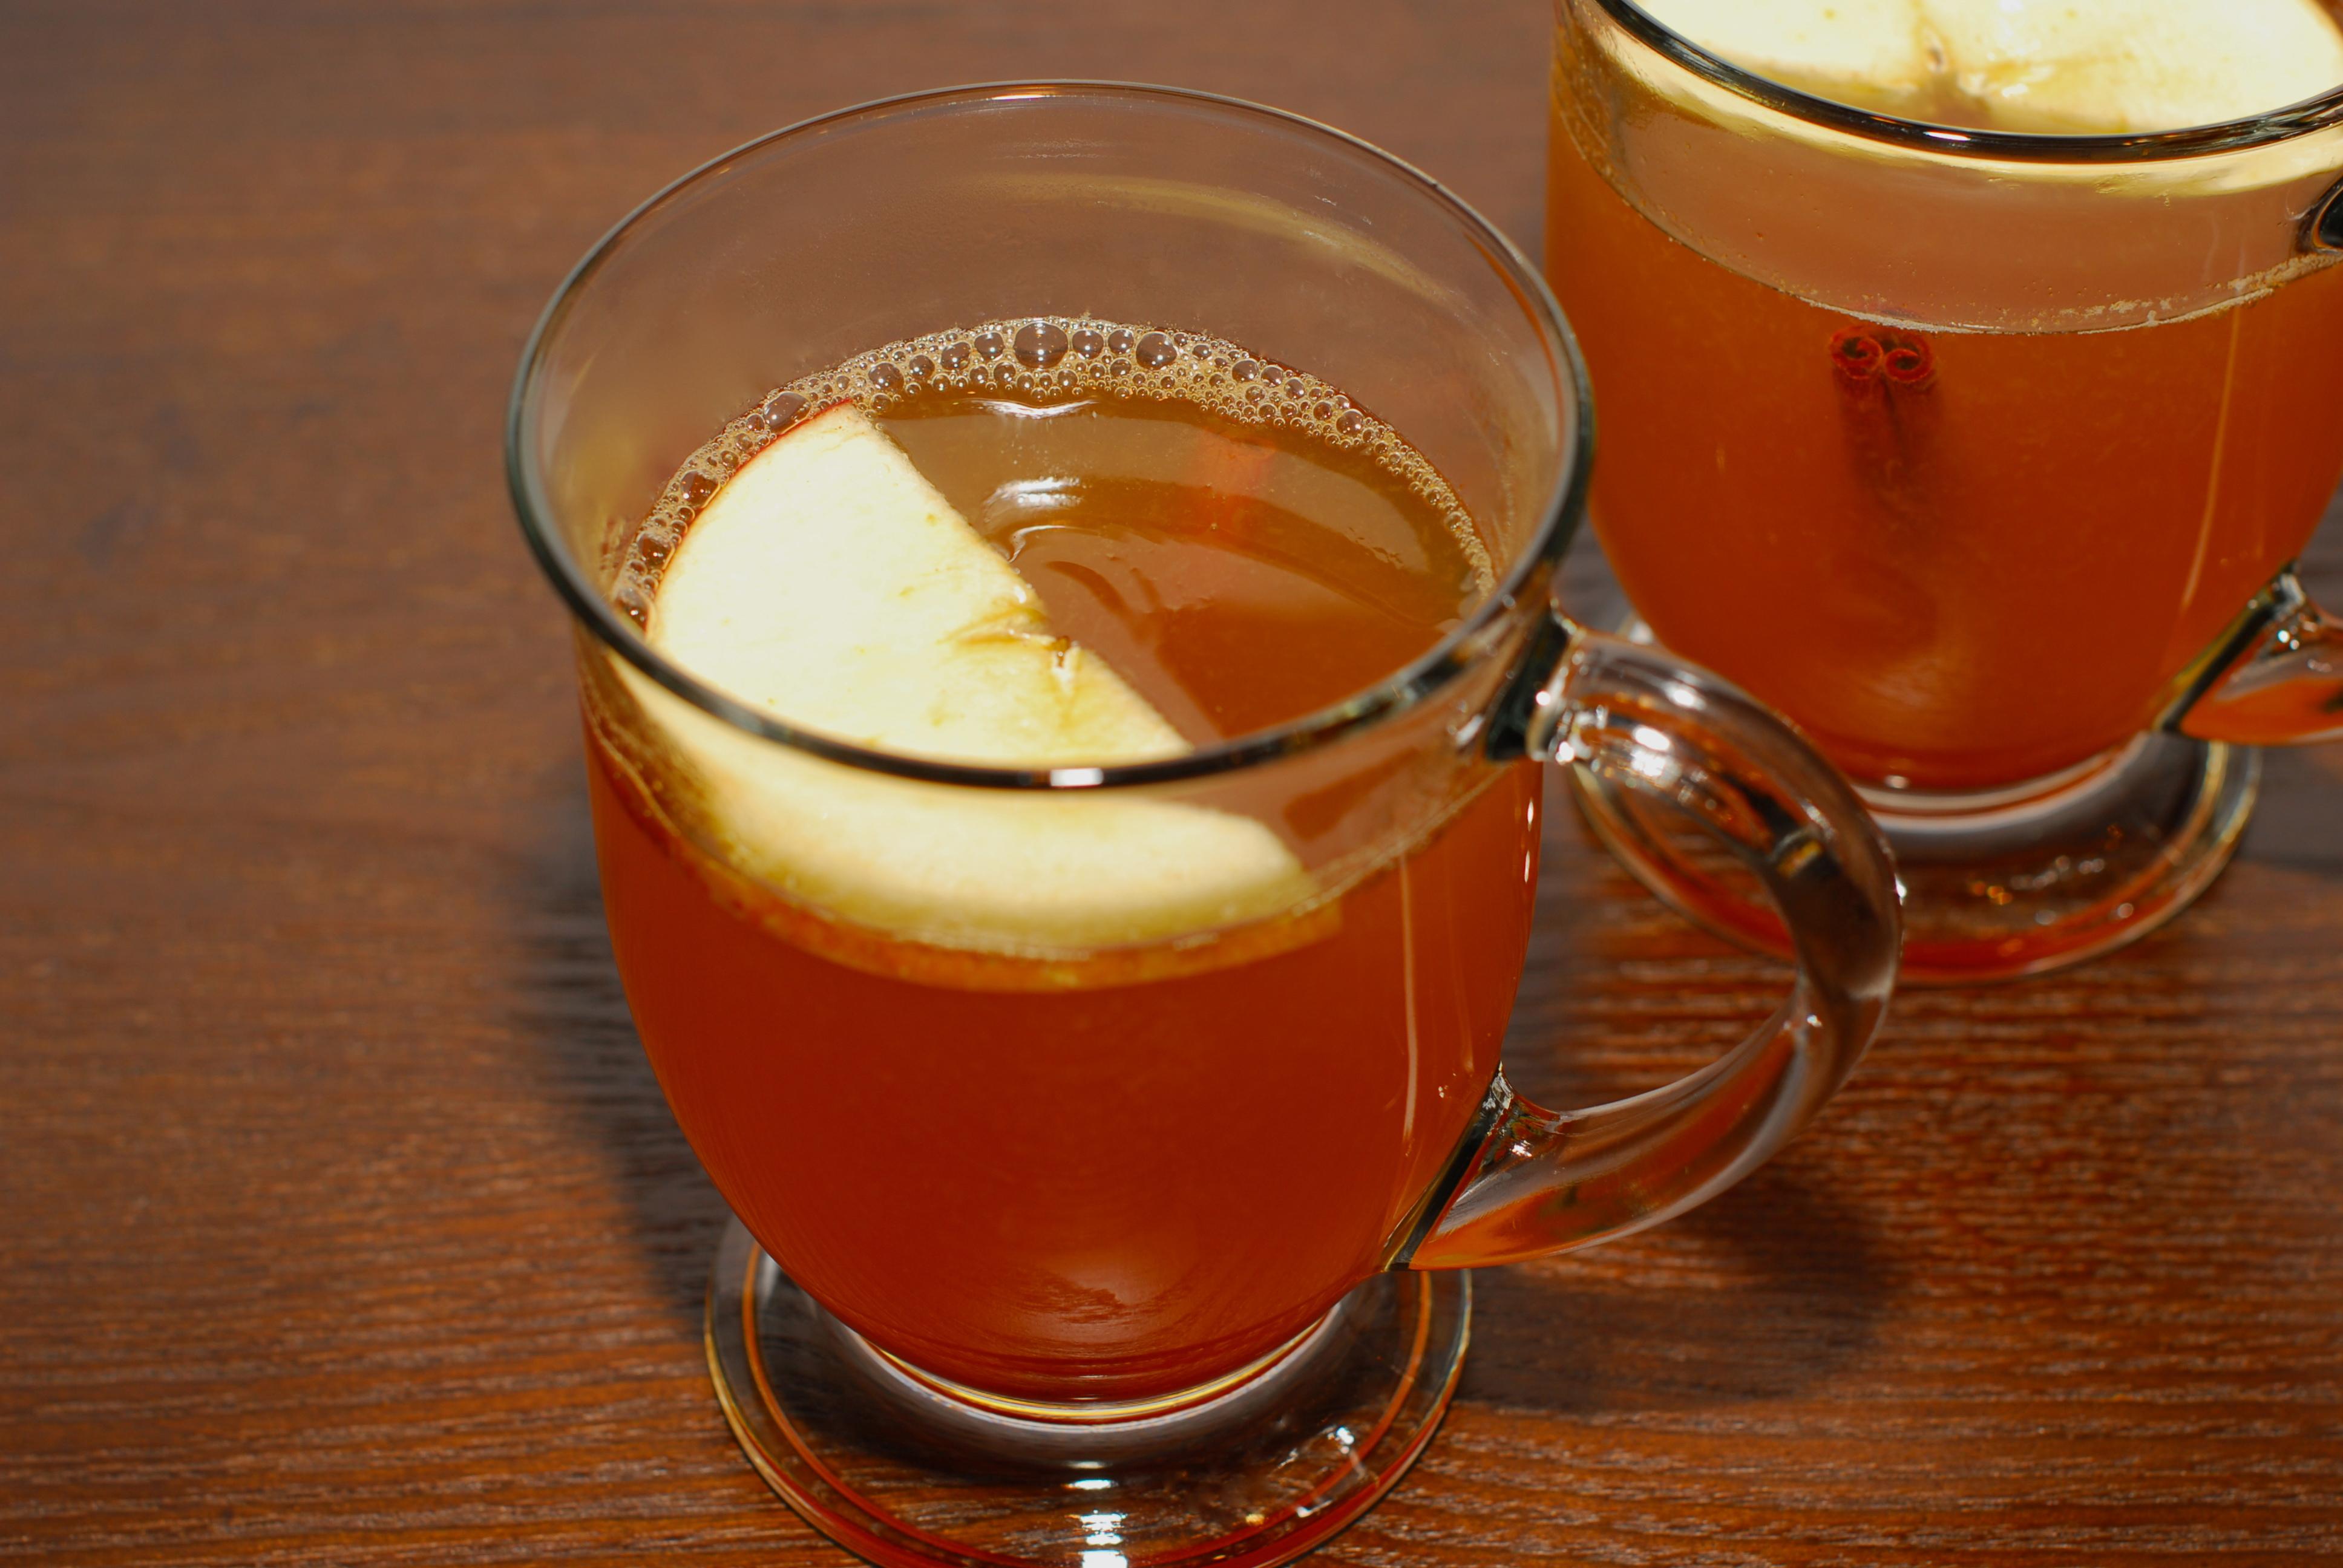 apple brandy hot toddy | veehive